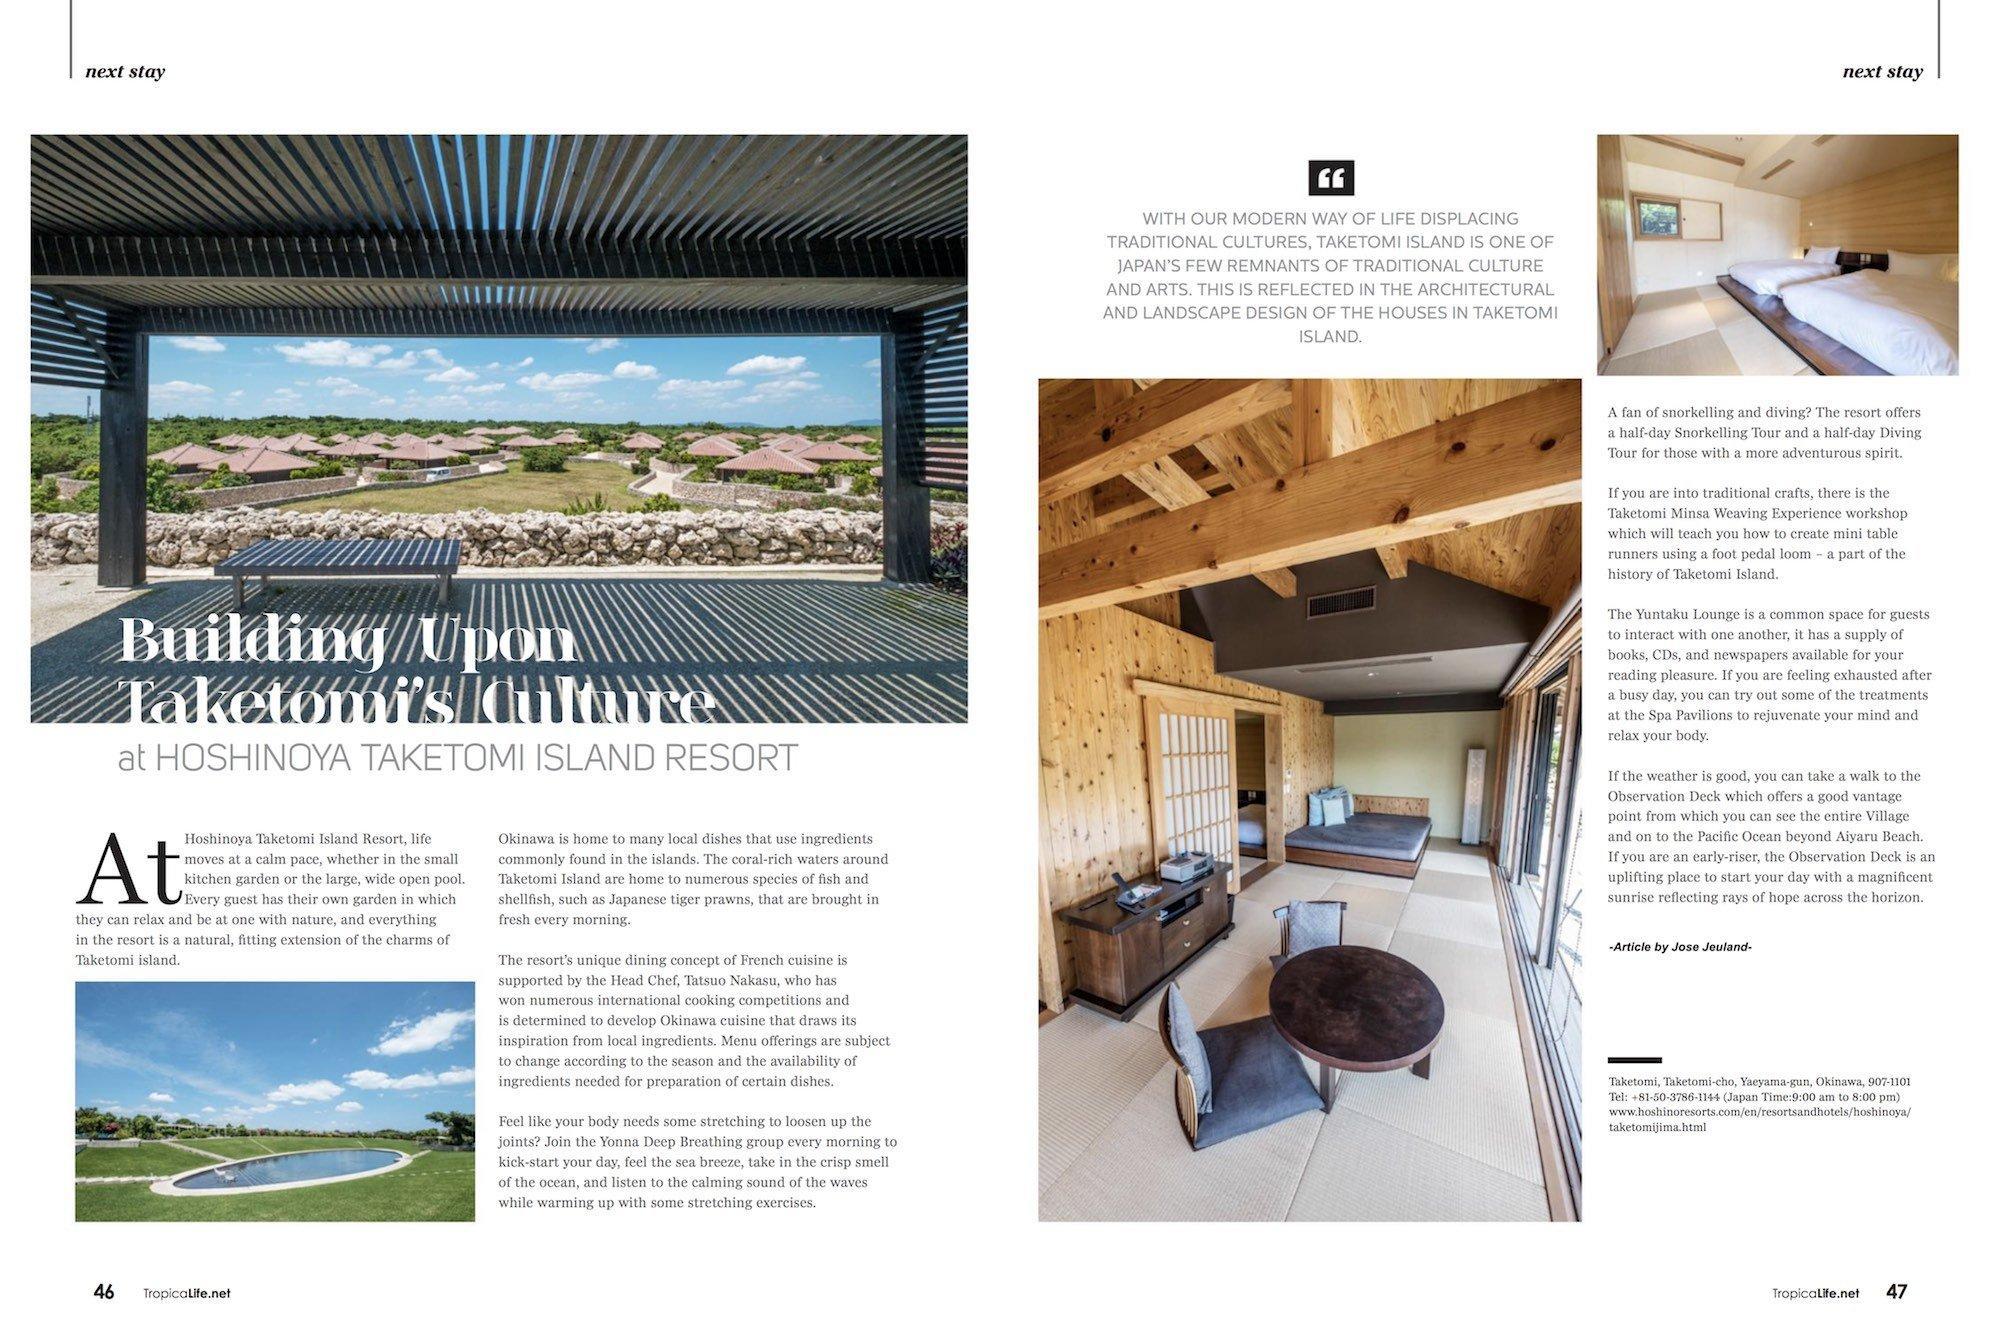 Tropical Life Magazine Travel Journey Okinawa Japan Jose Jeuland HOSHINOYA TAKETOMI ISLAND RESORT